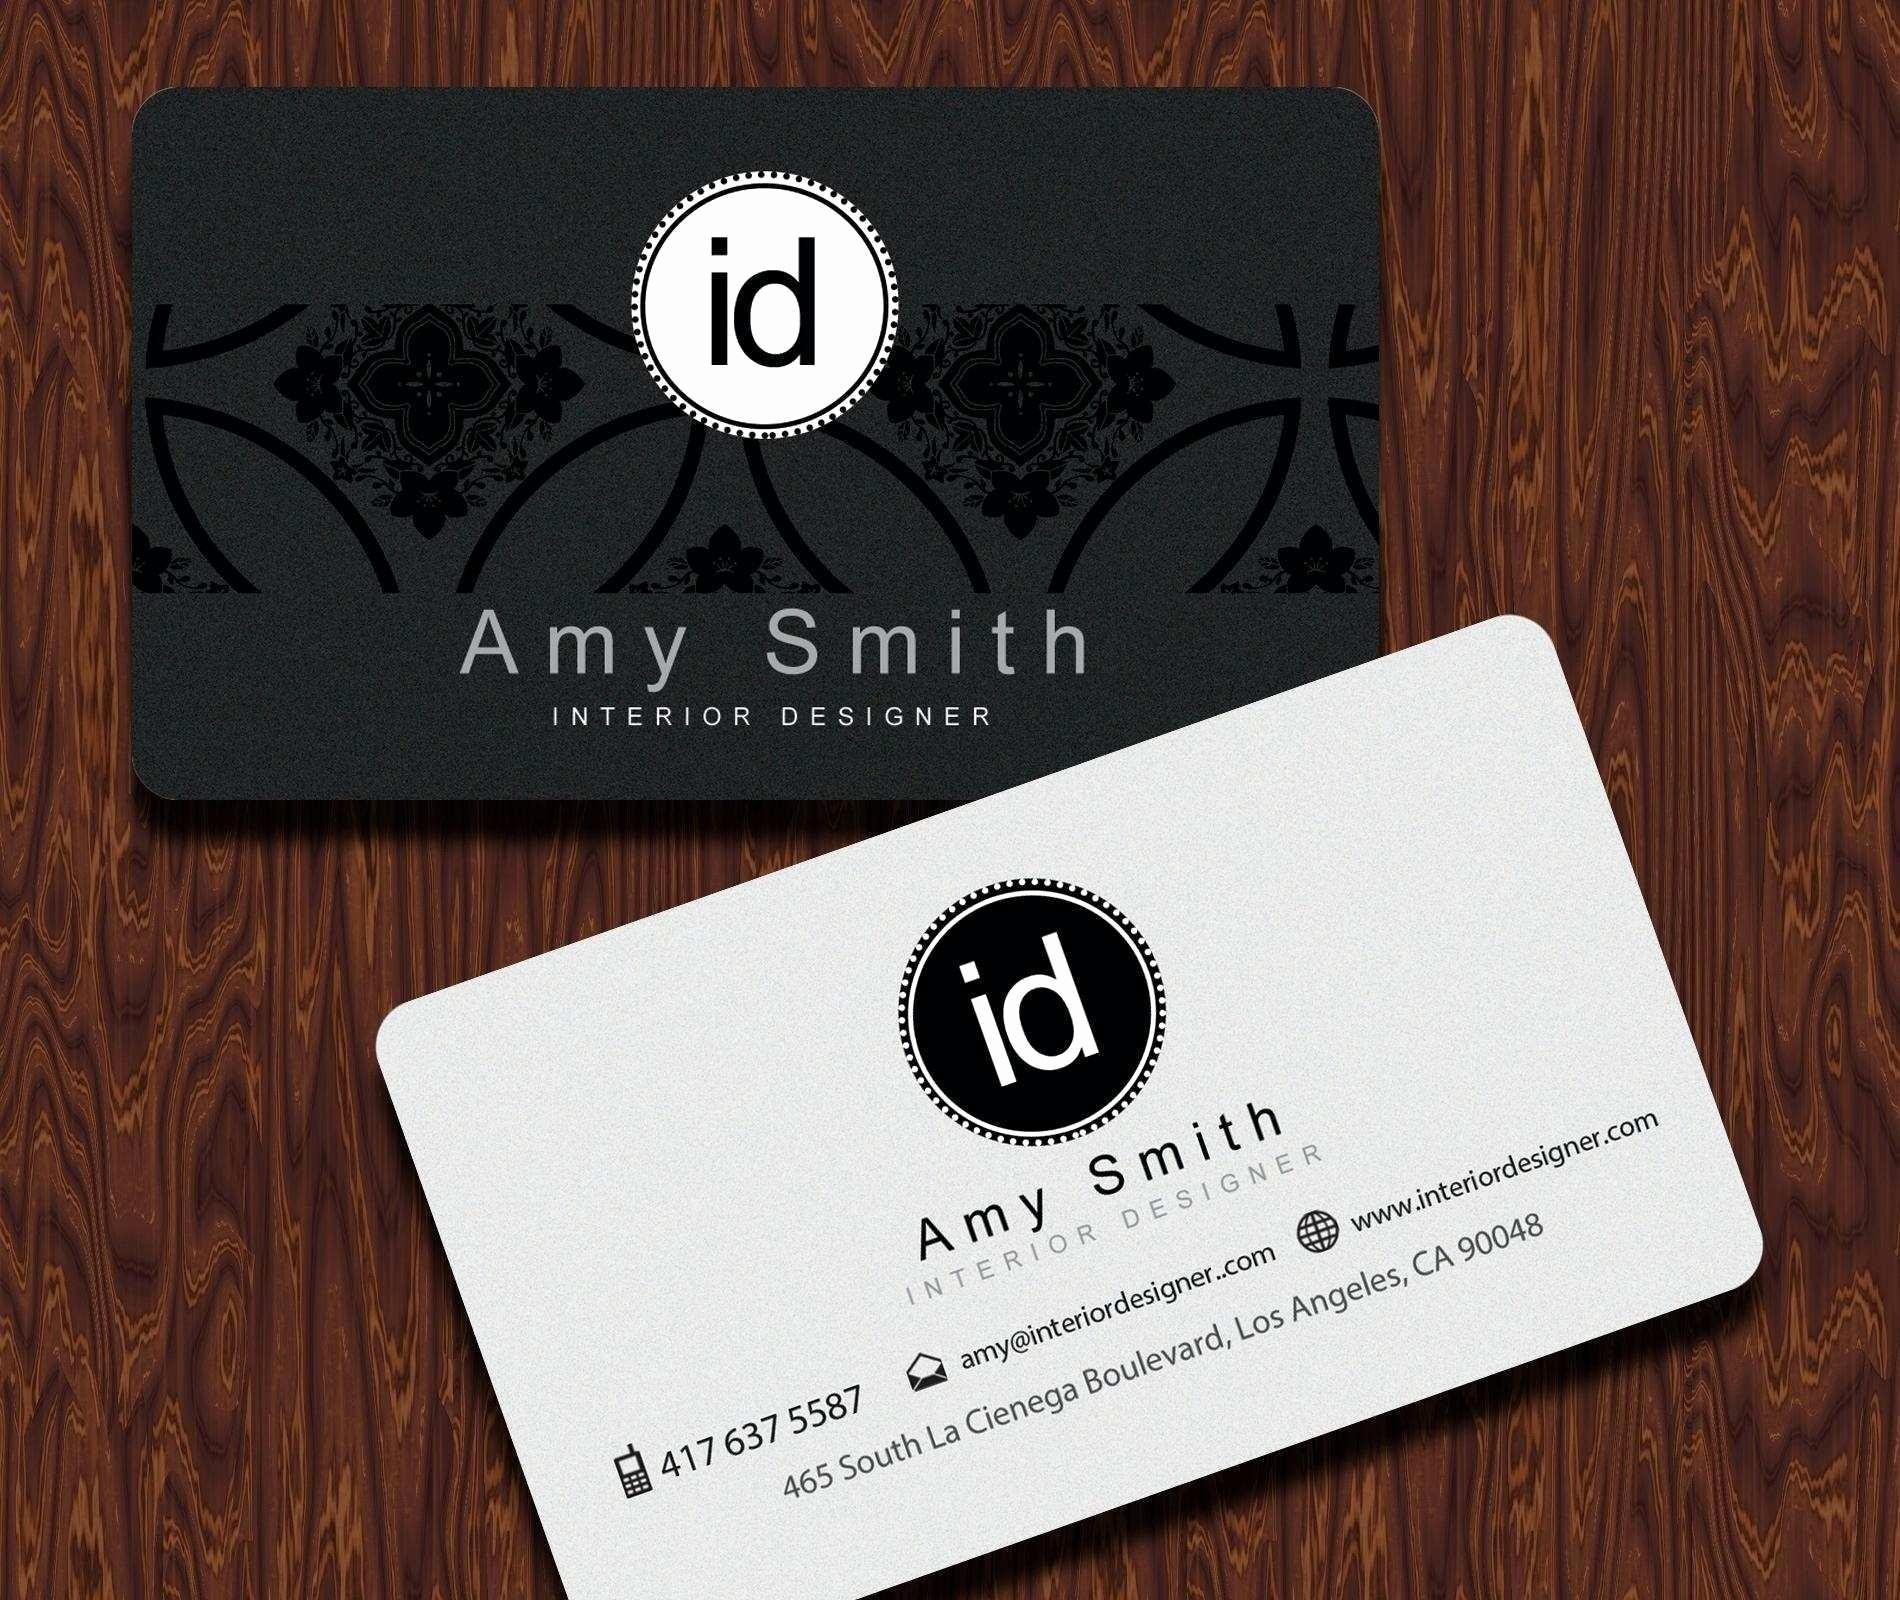 Business Card Maker Online Free Printable Elegant Business Card - Online Business Card Maker Free Printable